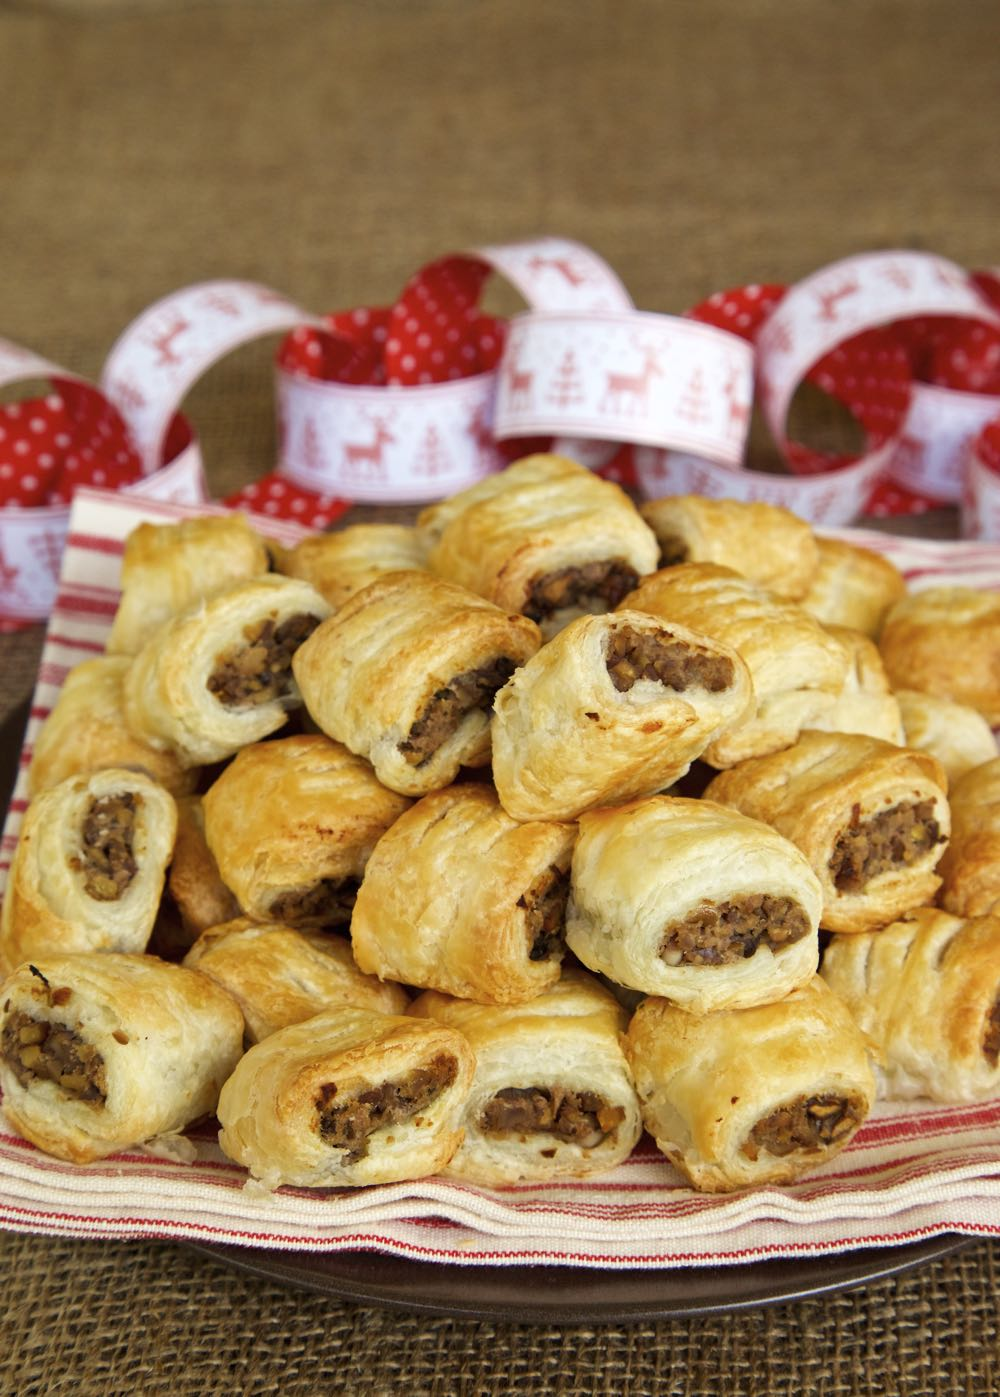 Vegan Sausage Rolls - chestnut, mushroom and red wine encased in crispy, flaky, puff pastry!